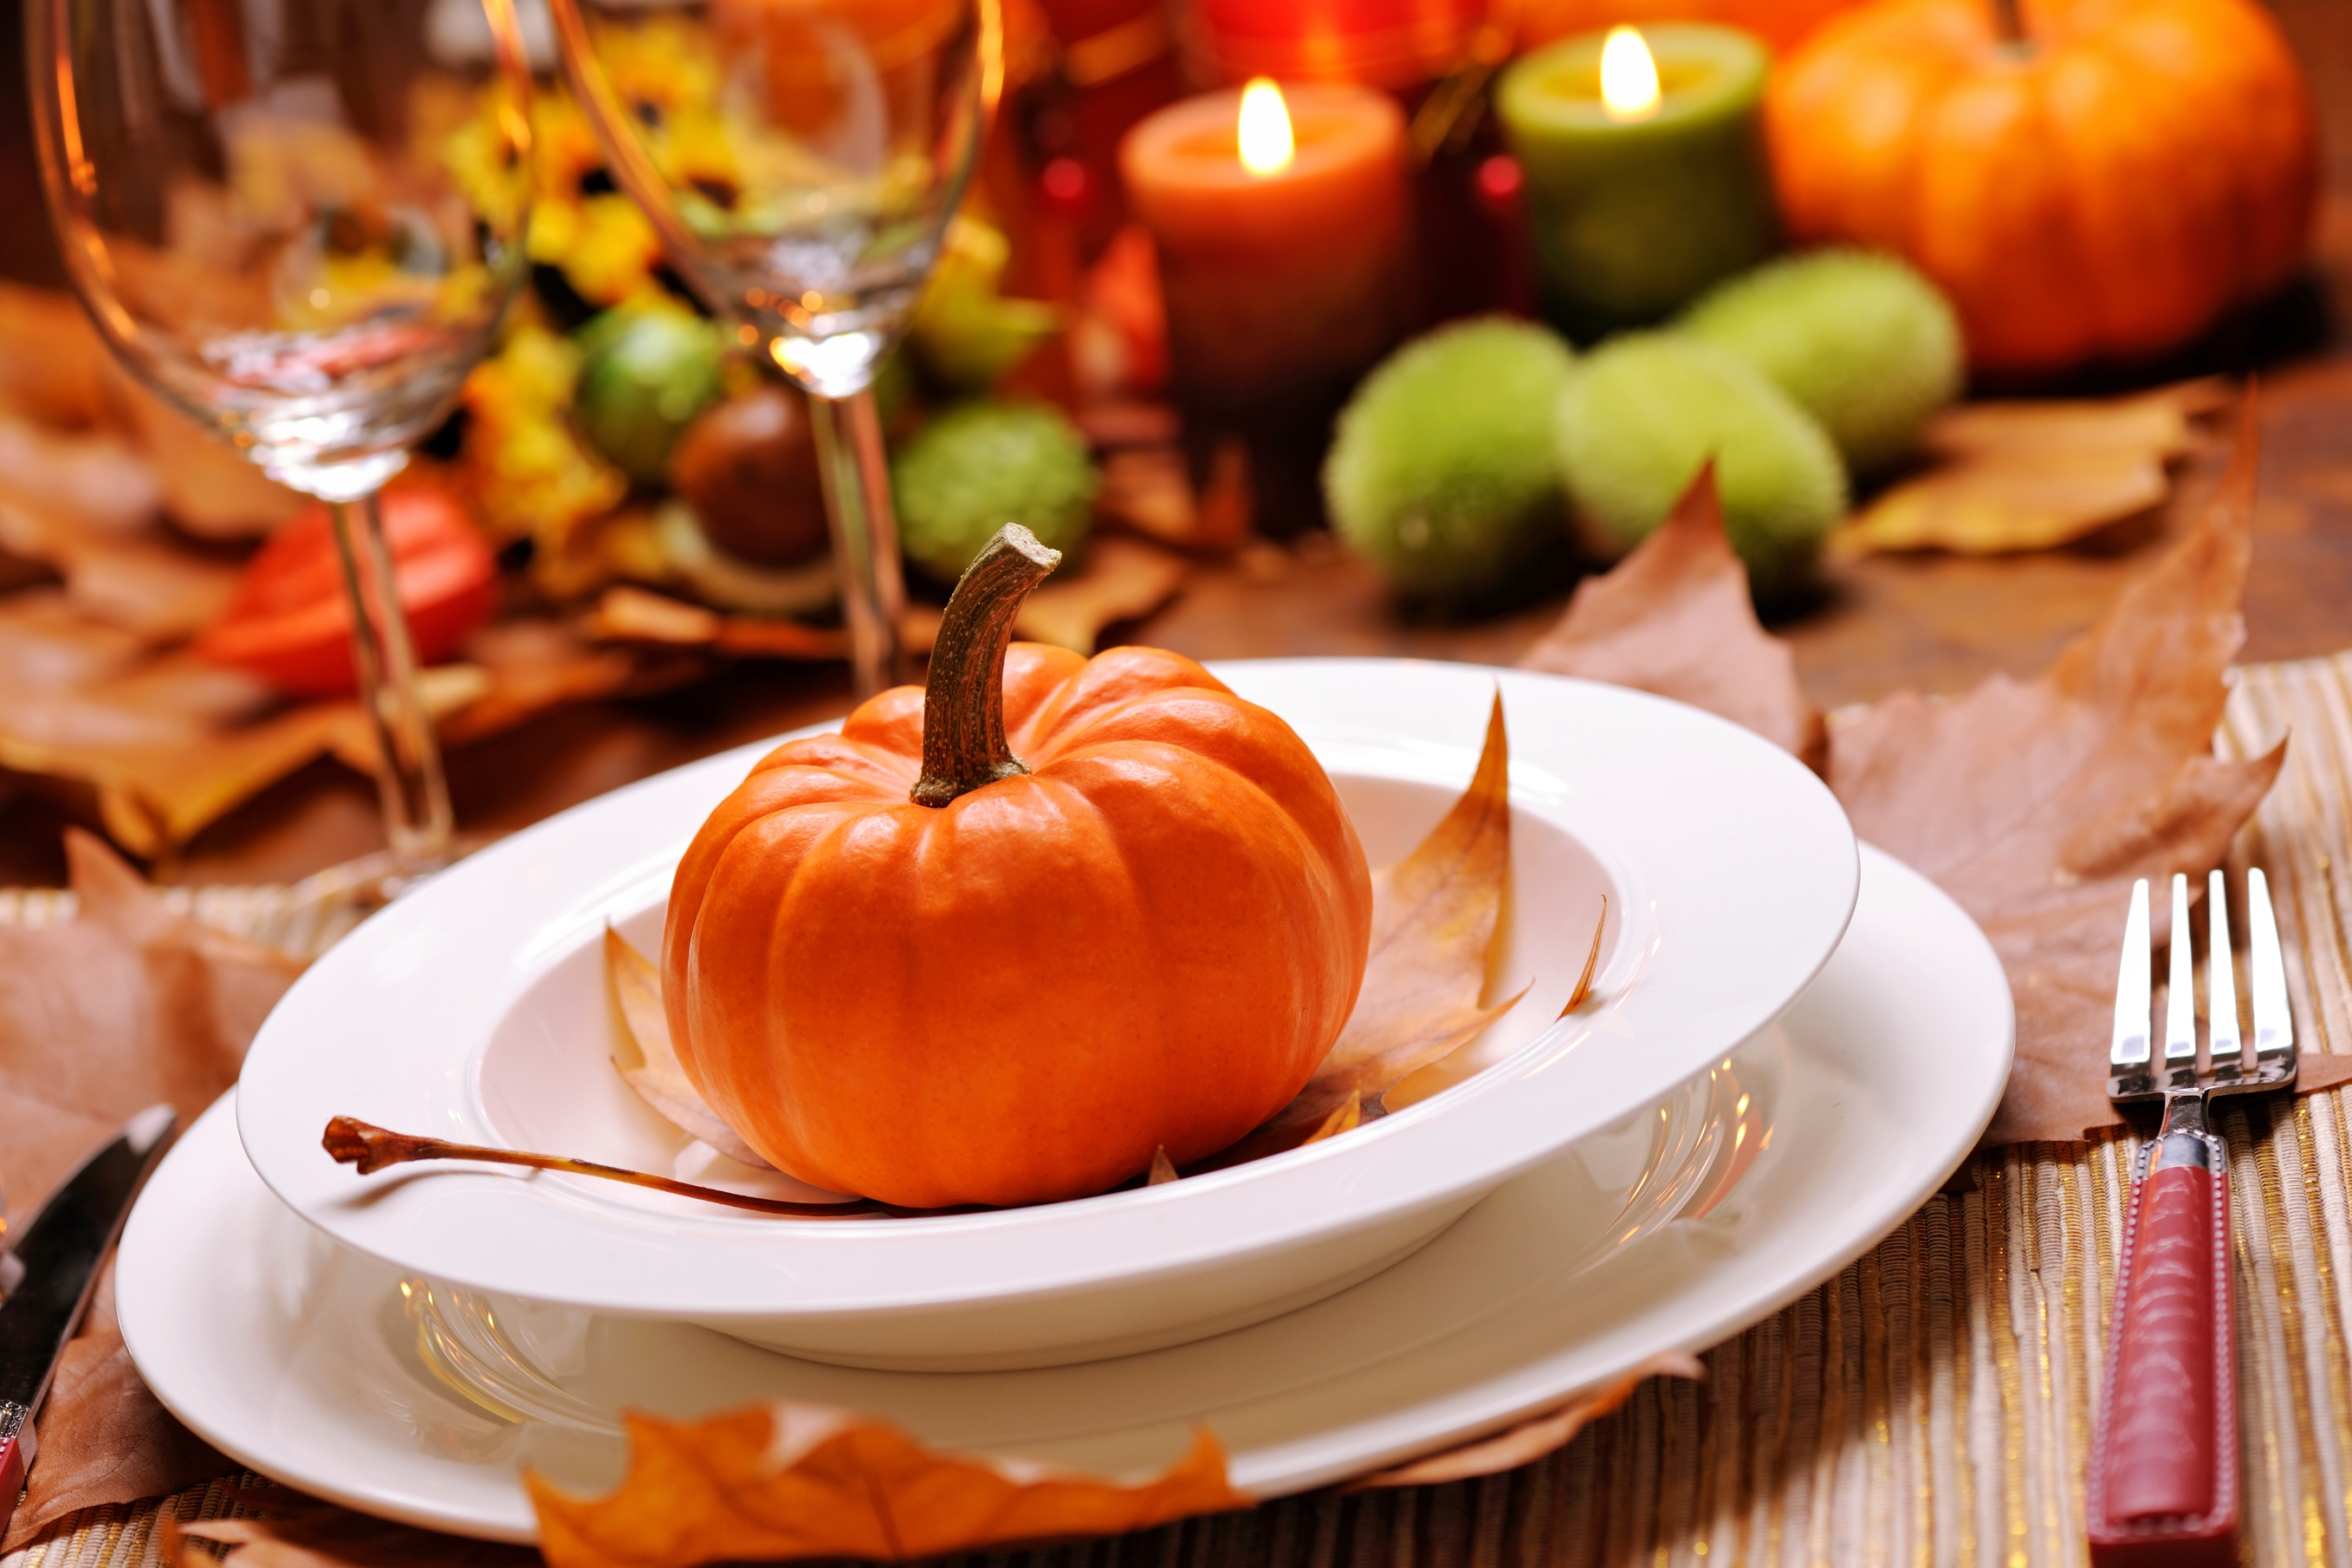 HalloweenPlaceSetting.jpg